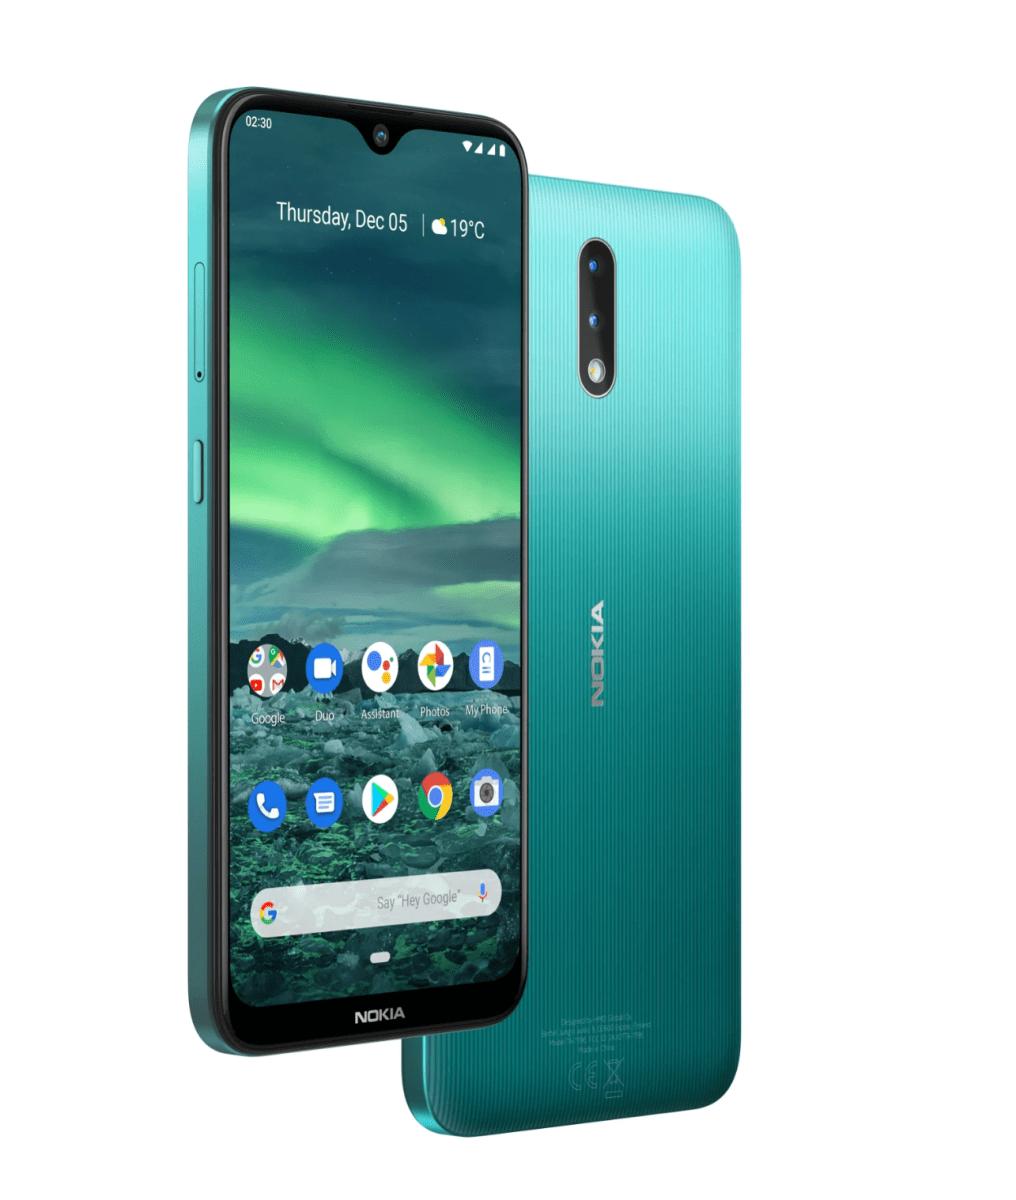 "Nokia C1 - 5.45"" - 16GB + 1 GB - Dual Sim - 2500 mAh - 5MP"